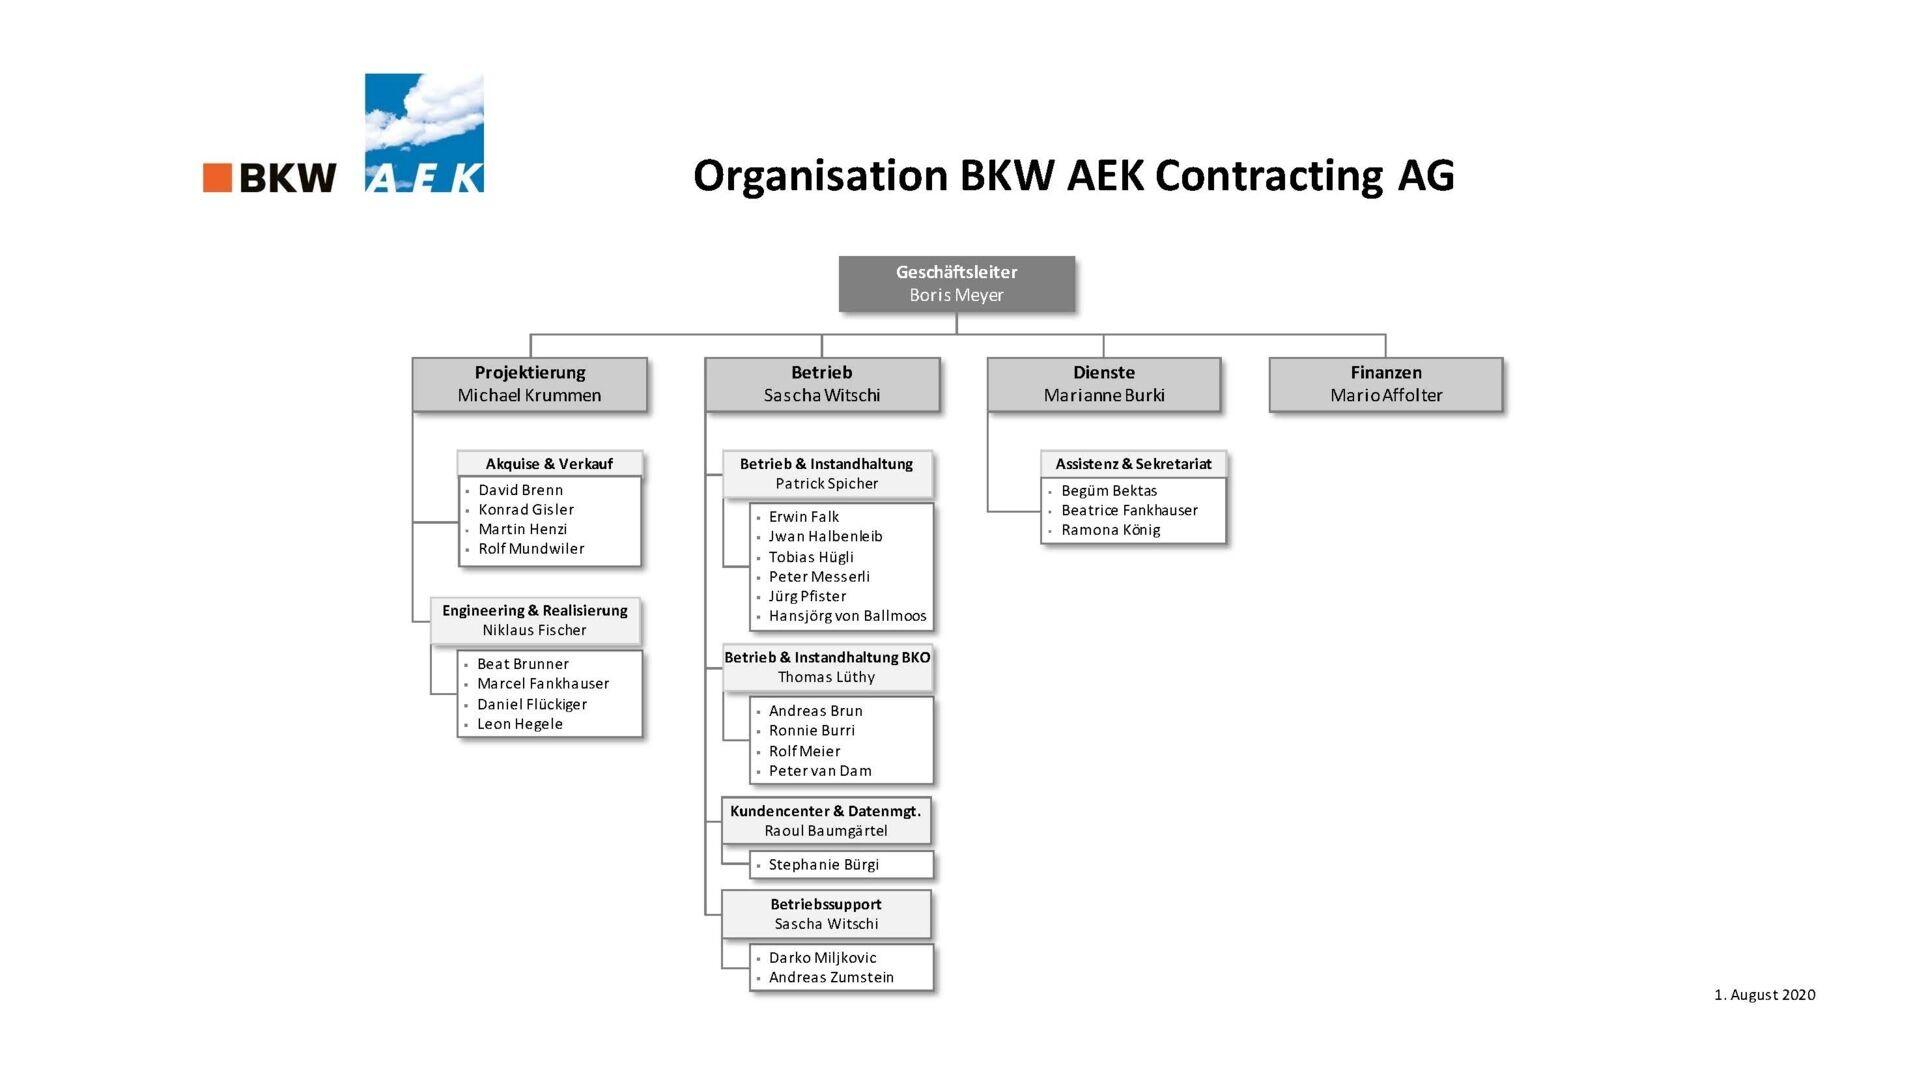 Organigramm BKW AEK Contracting AG.jpg